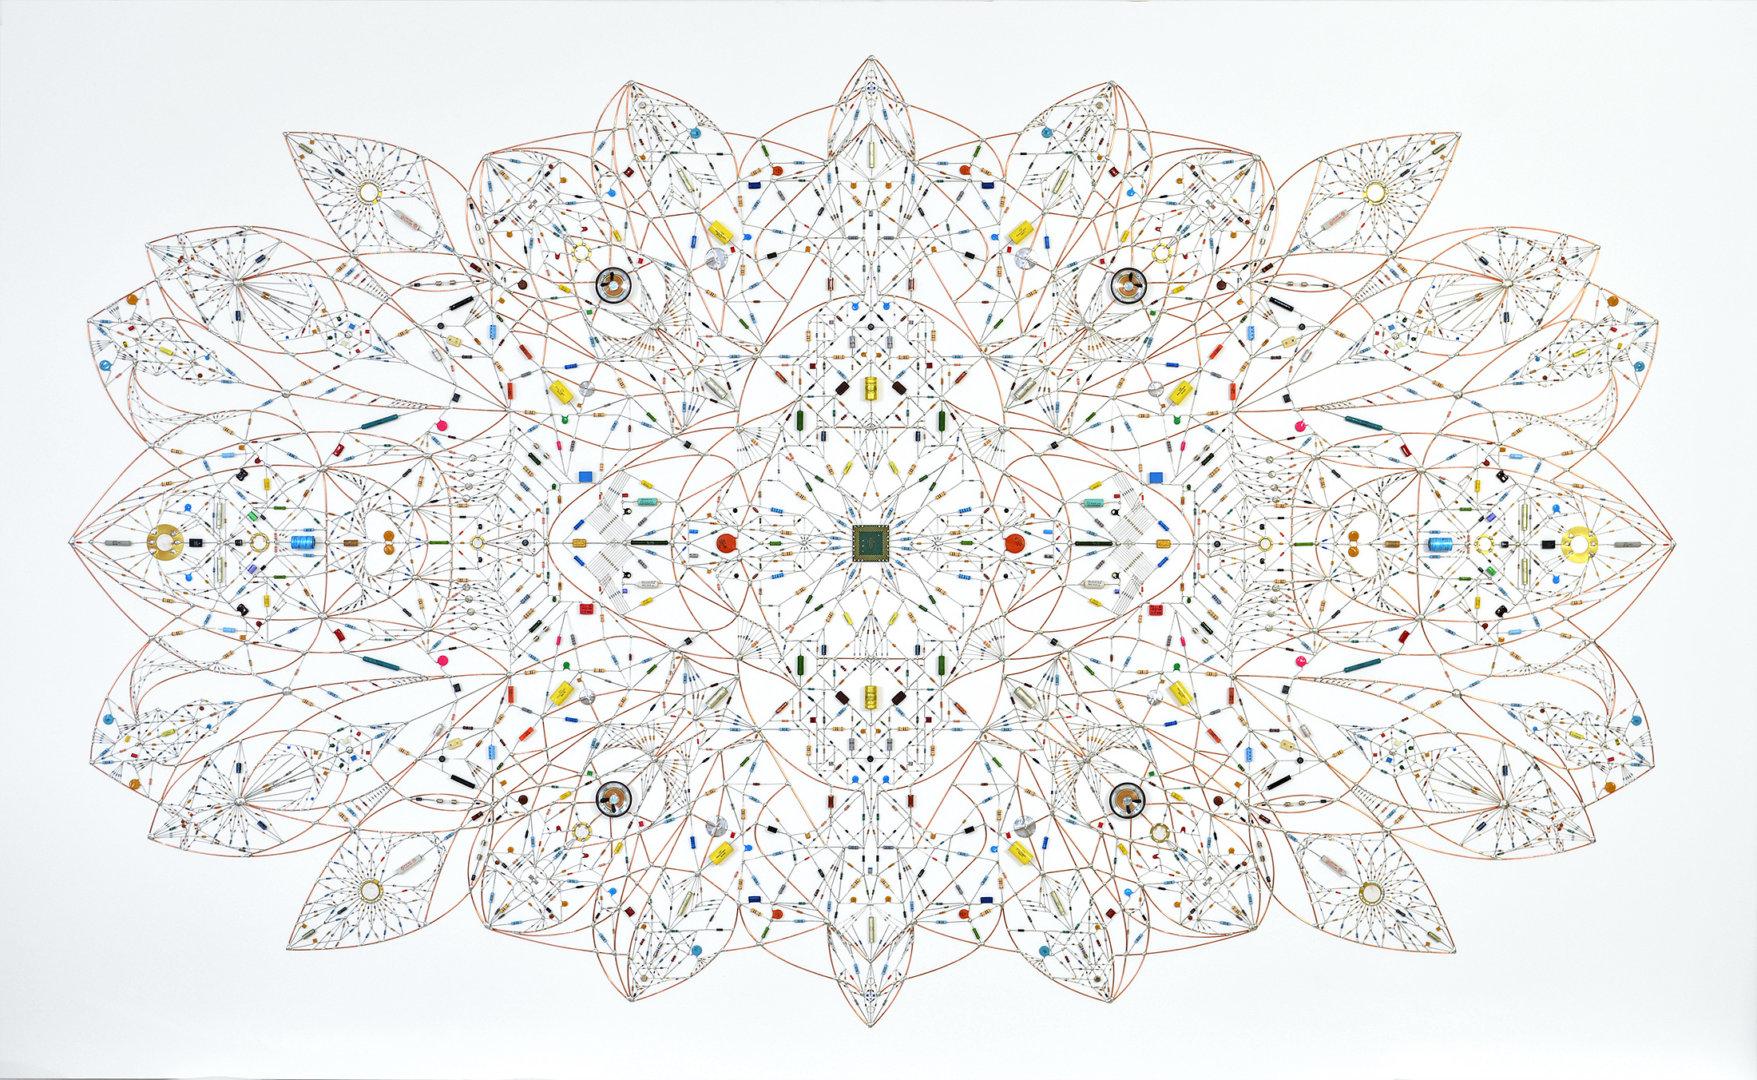 Leonardo Ulian's Technological mandala 131 – Blooming mind ( source )  Electronic components, copper wire, acrylic paint, varnish, paper, wood frame, 240 cm x 146 cm x 4,5 cm, 2018